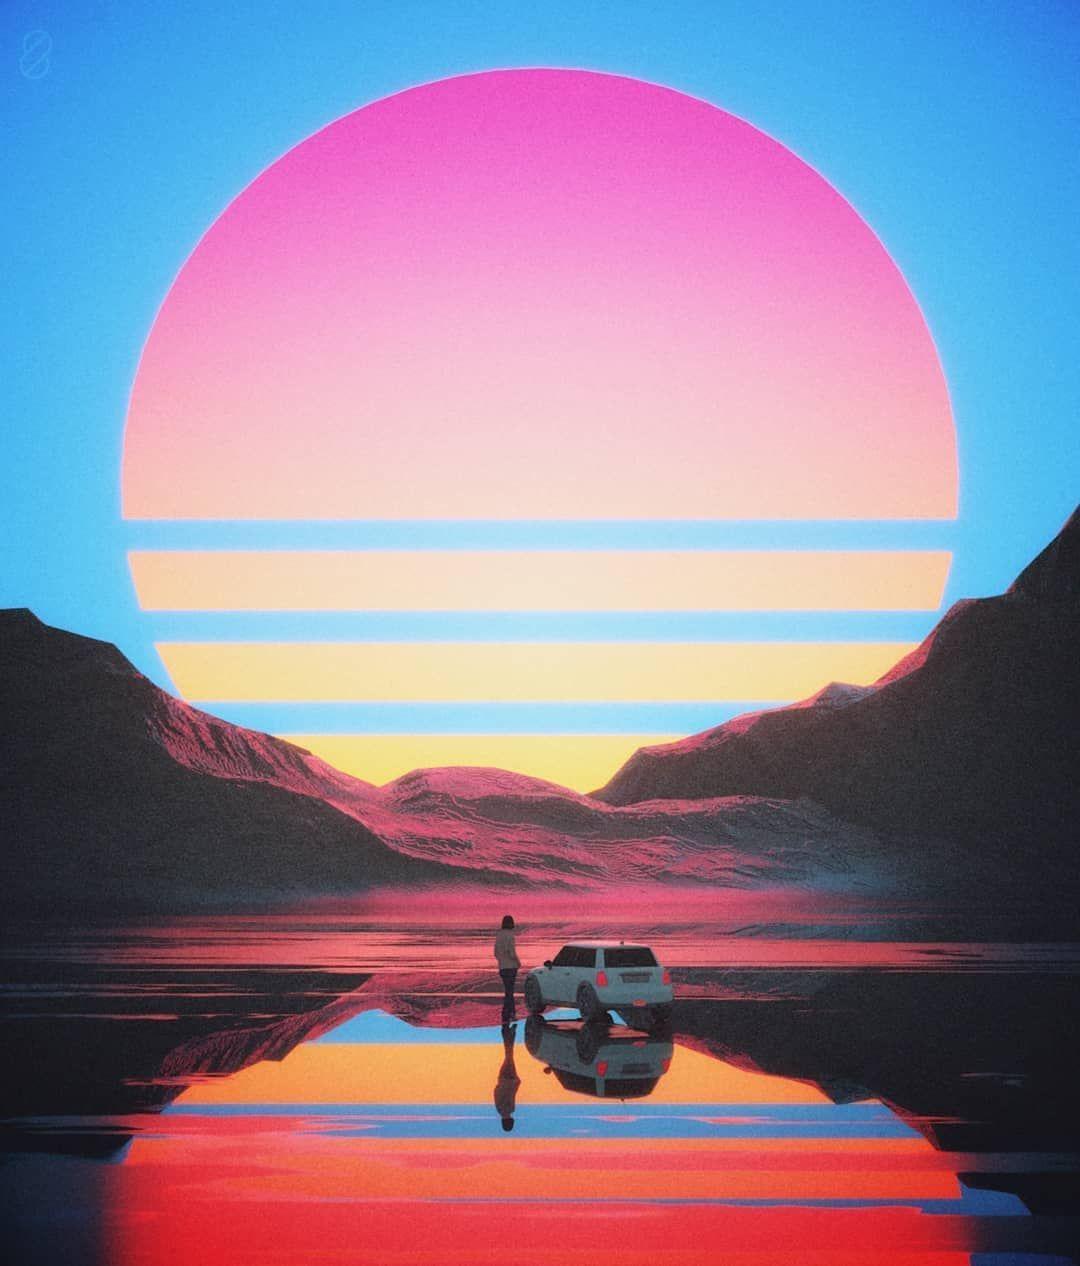 Pin By Sankhadeep Sengupta On Stranger Things In 2020 Futuristic Art Synthwave Futuristic